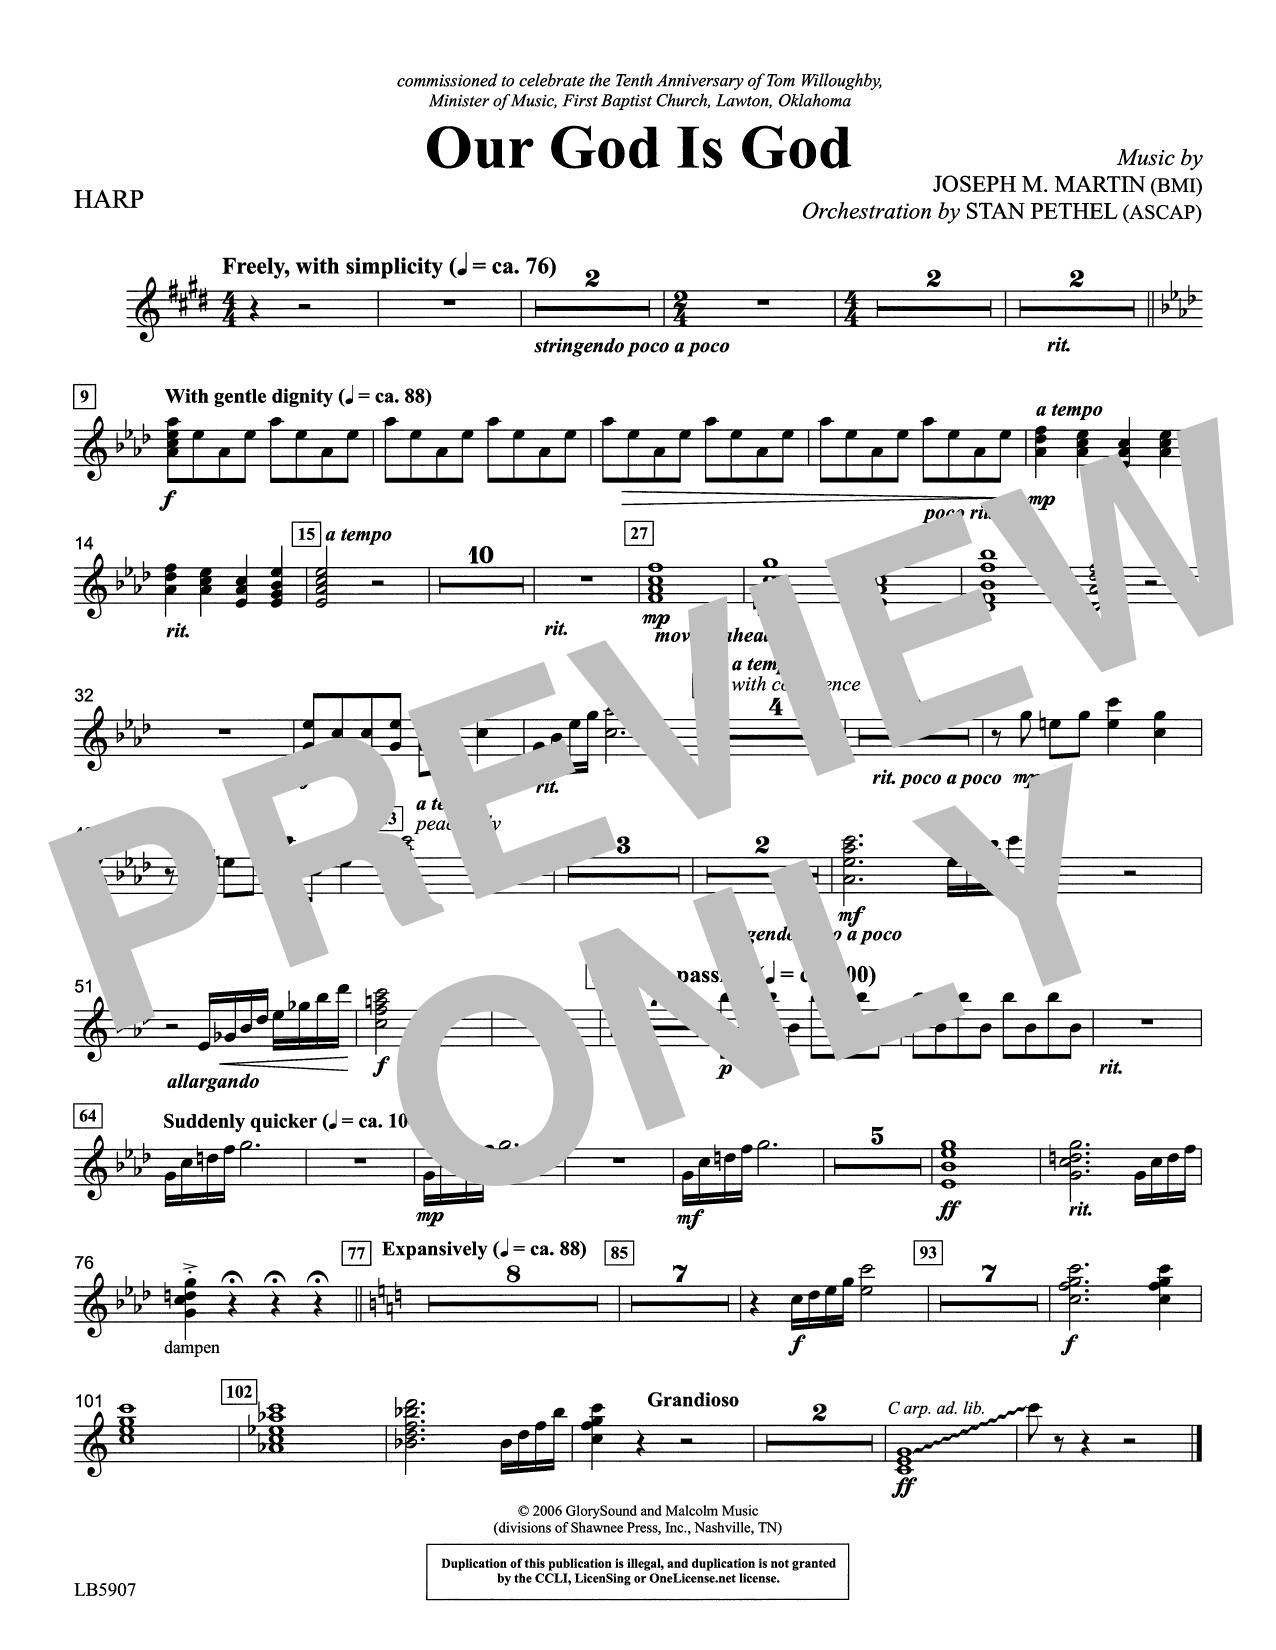 Our God Is God - Harp Sheet Music